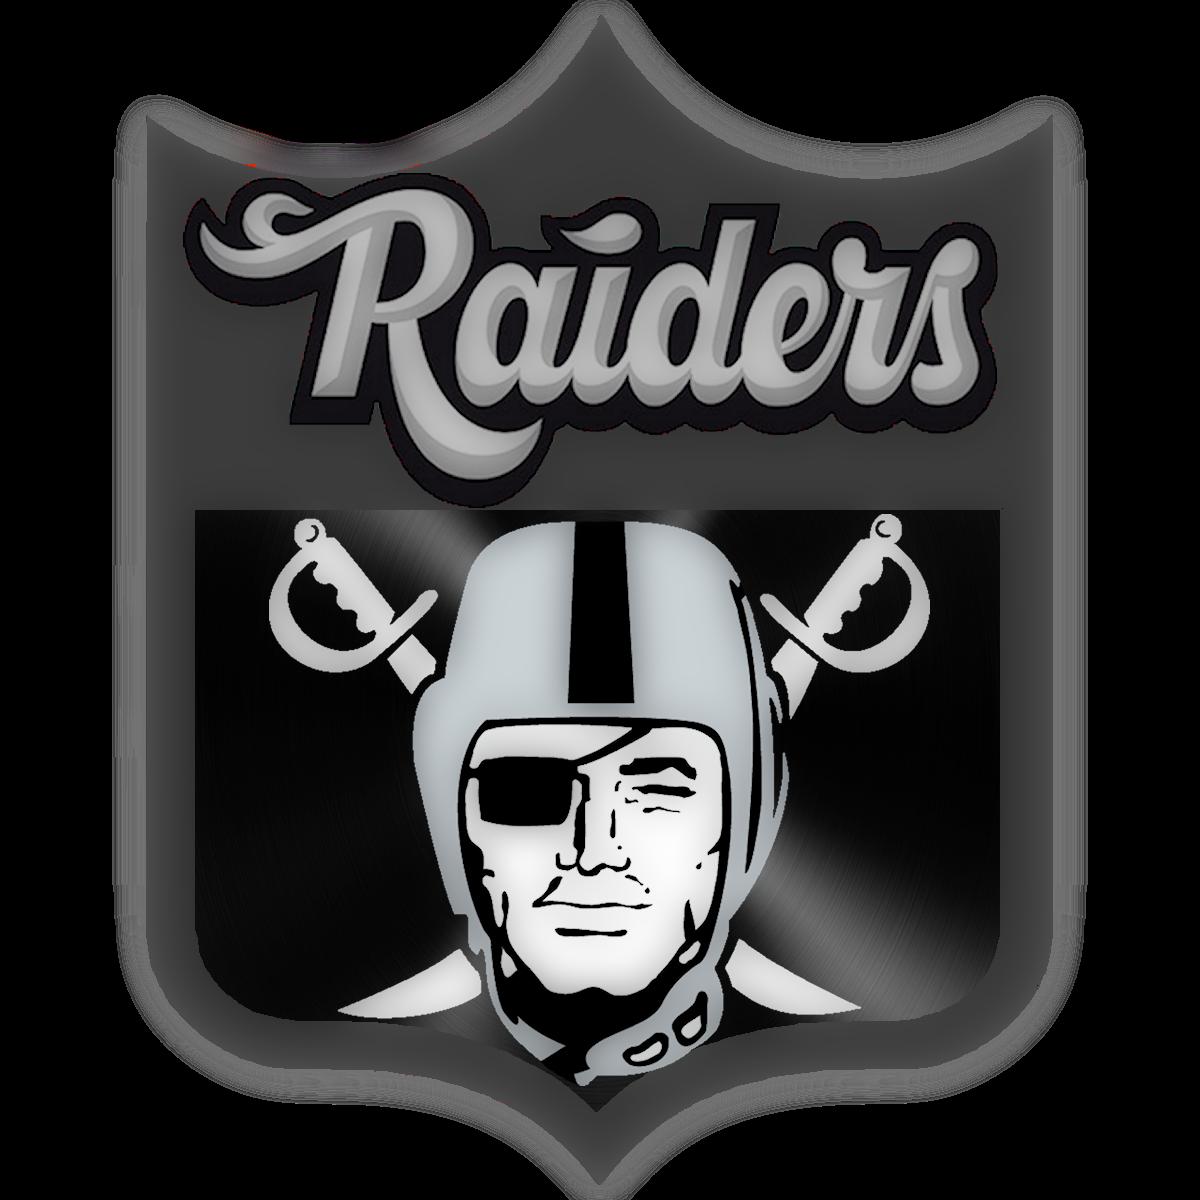 oakland raiders logo raiders baby pinterest oakland raiders